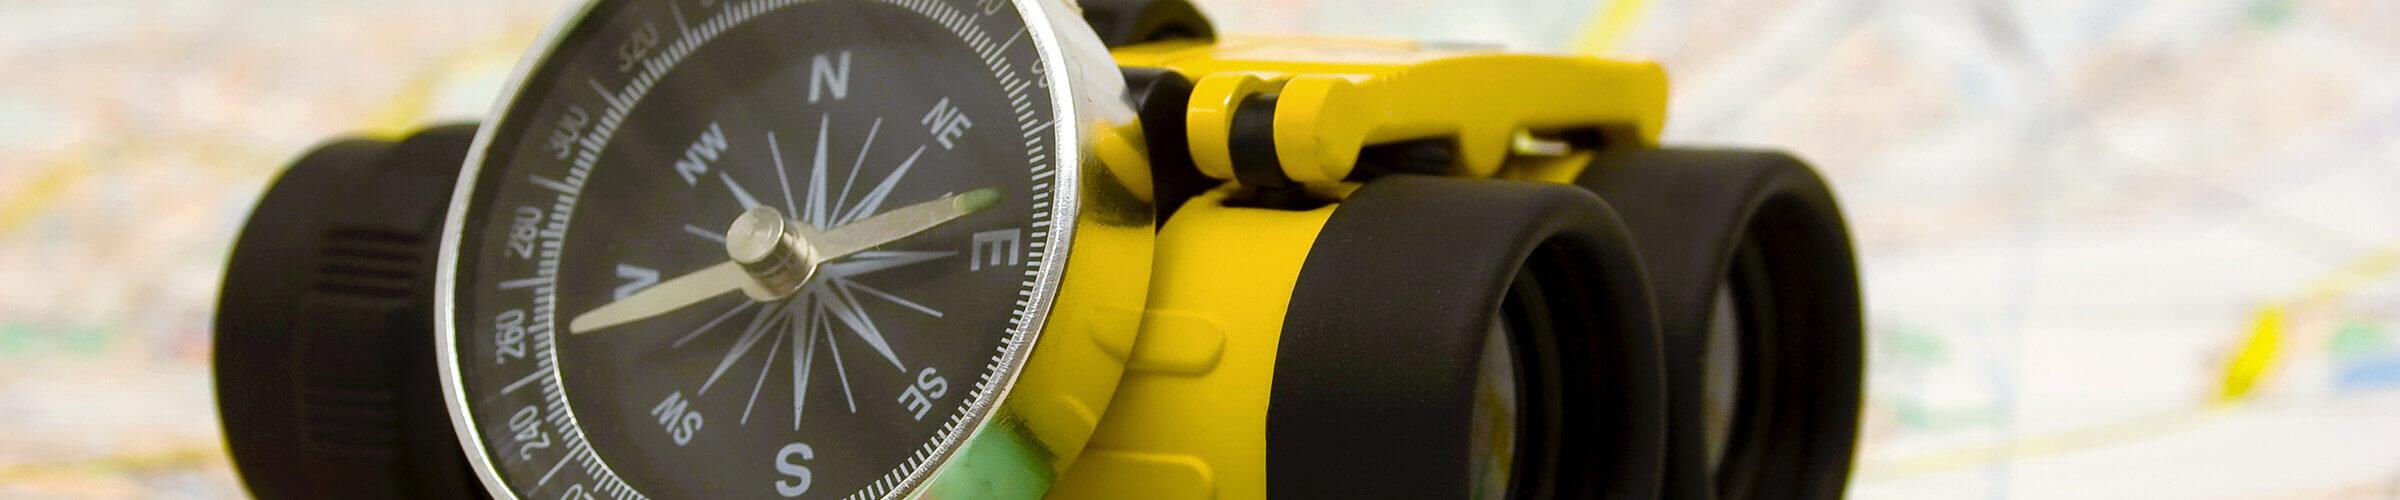 Fernglas---Kompass---Karte---Supervision---Holger-Hagenlocher---Berater,-Coach,-Dozent---small